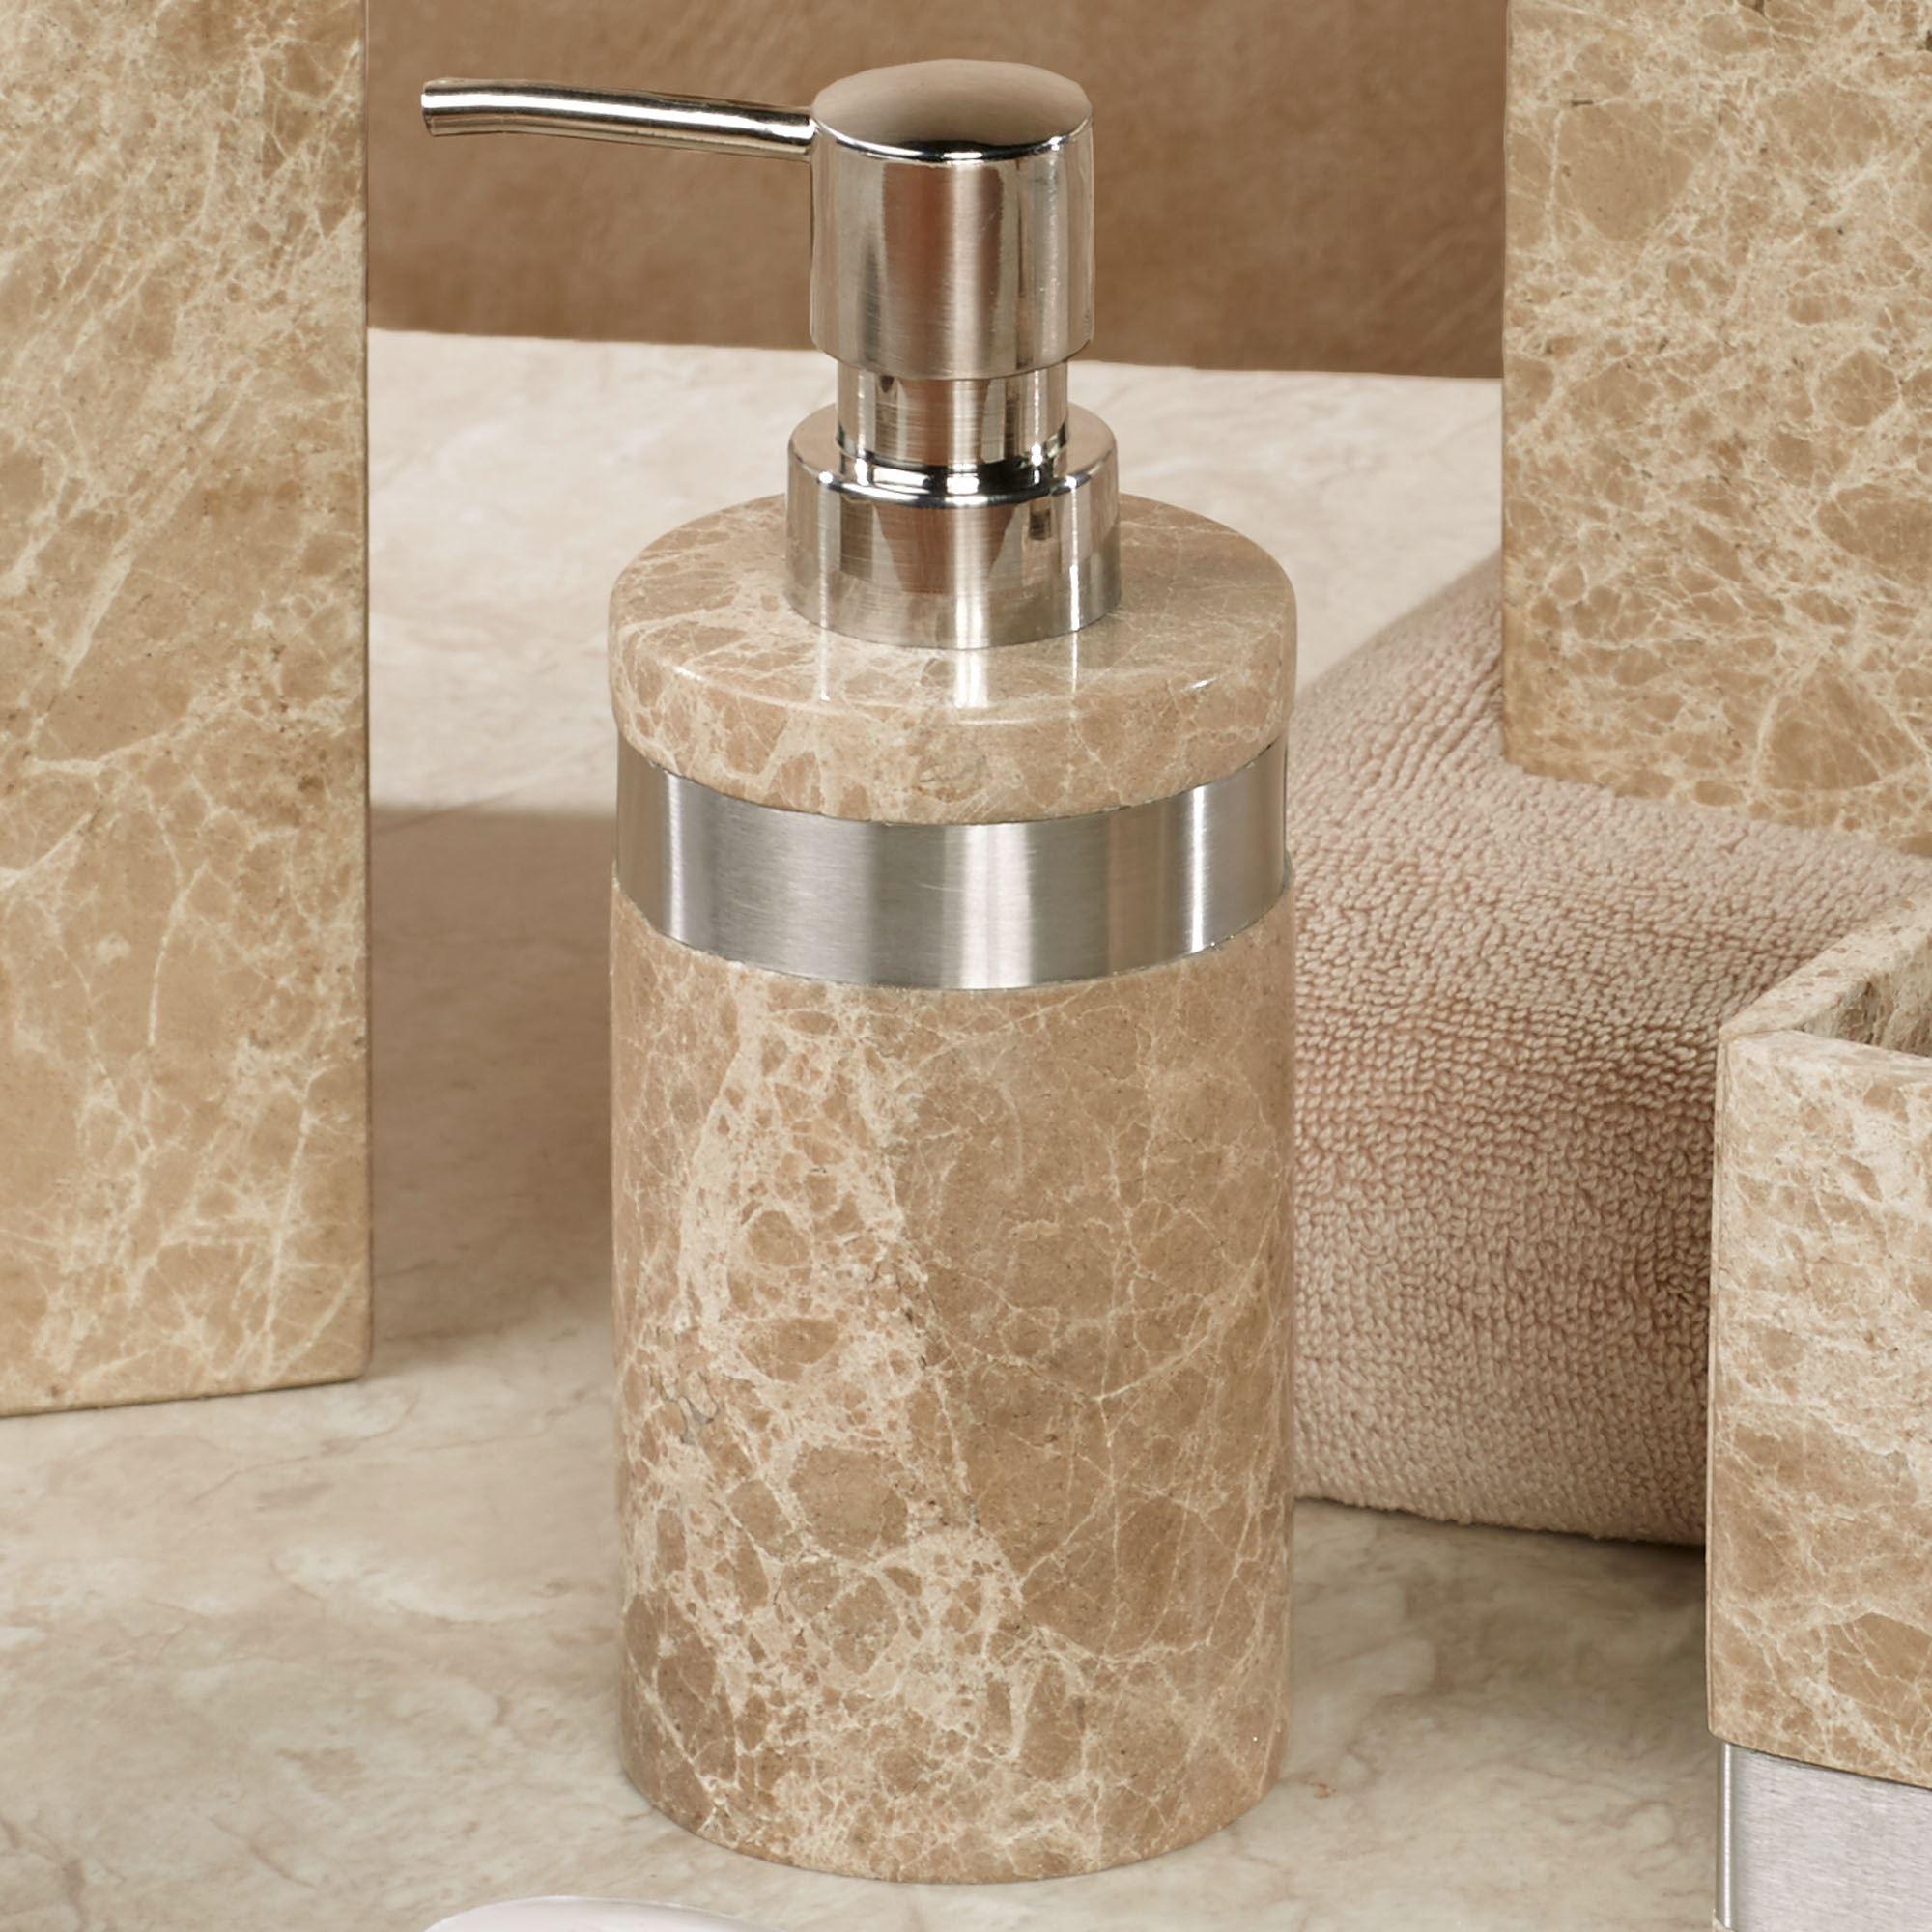 Marbella Marble Bath Accessories